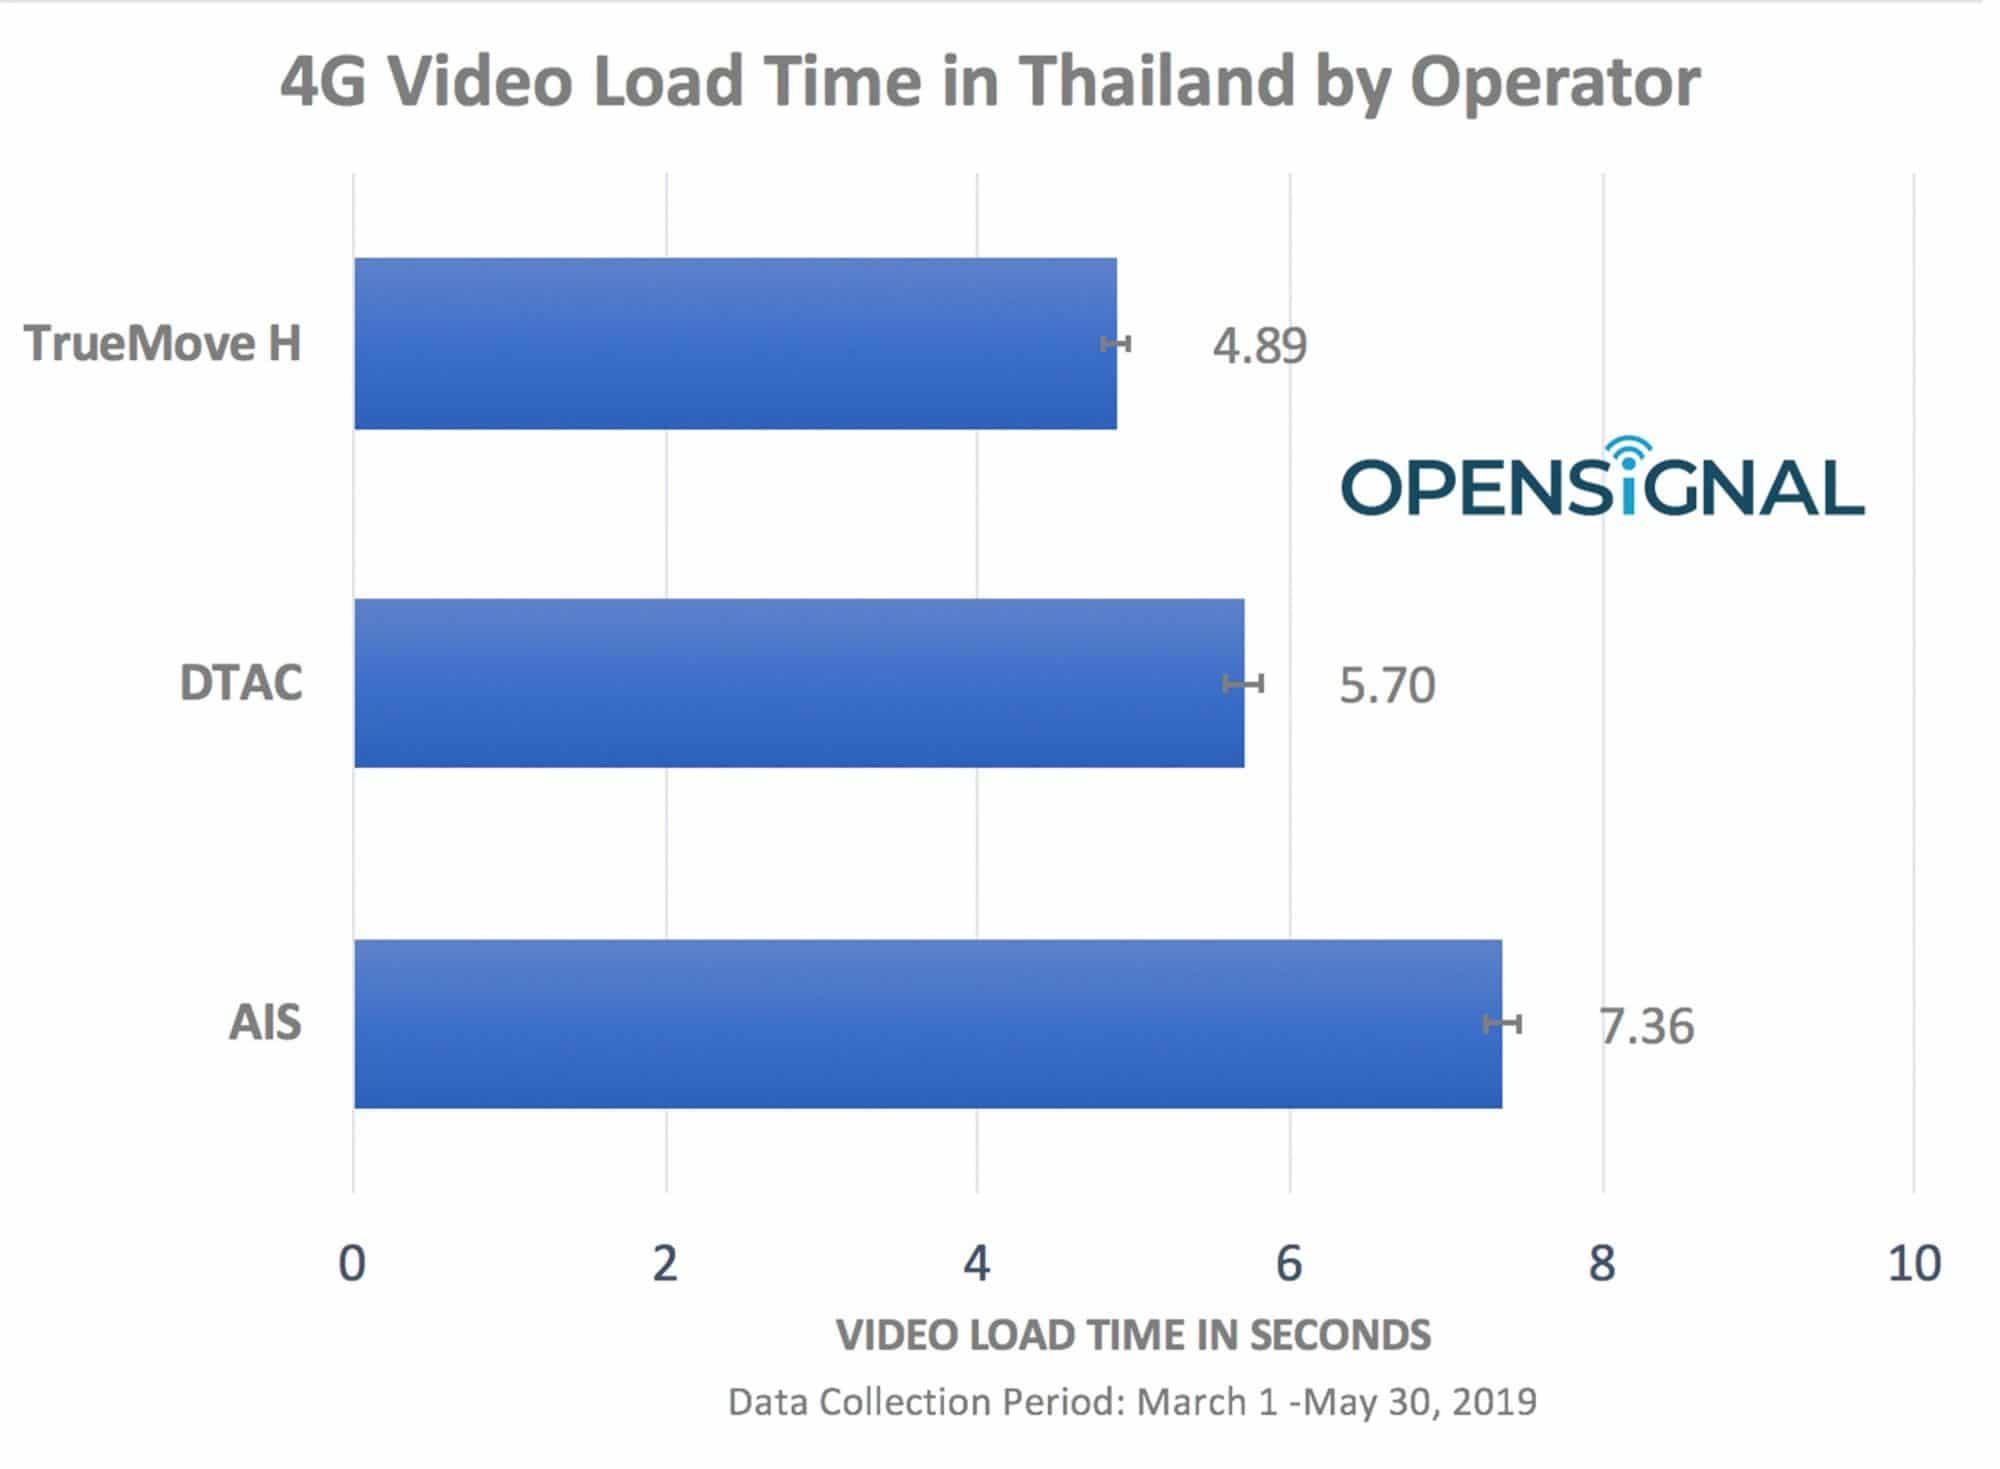 Opensignal เผยอินเทอร์เน็ตมือถือไทยมีปัญหาในการสตรีมวิดีโอ 2